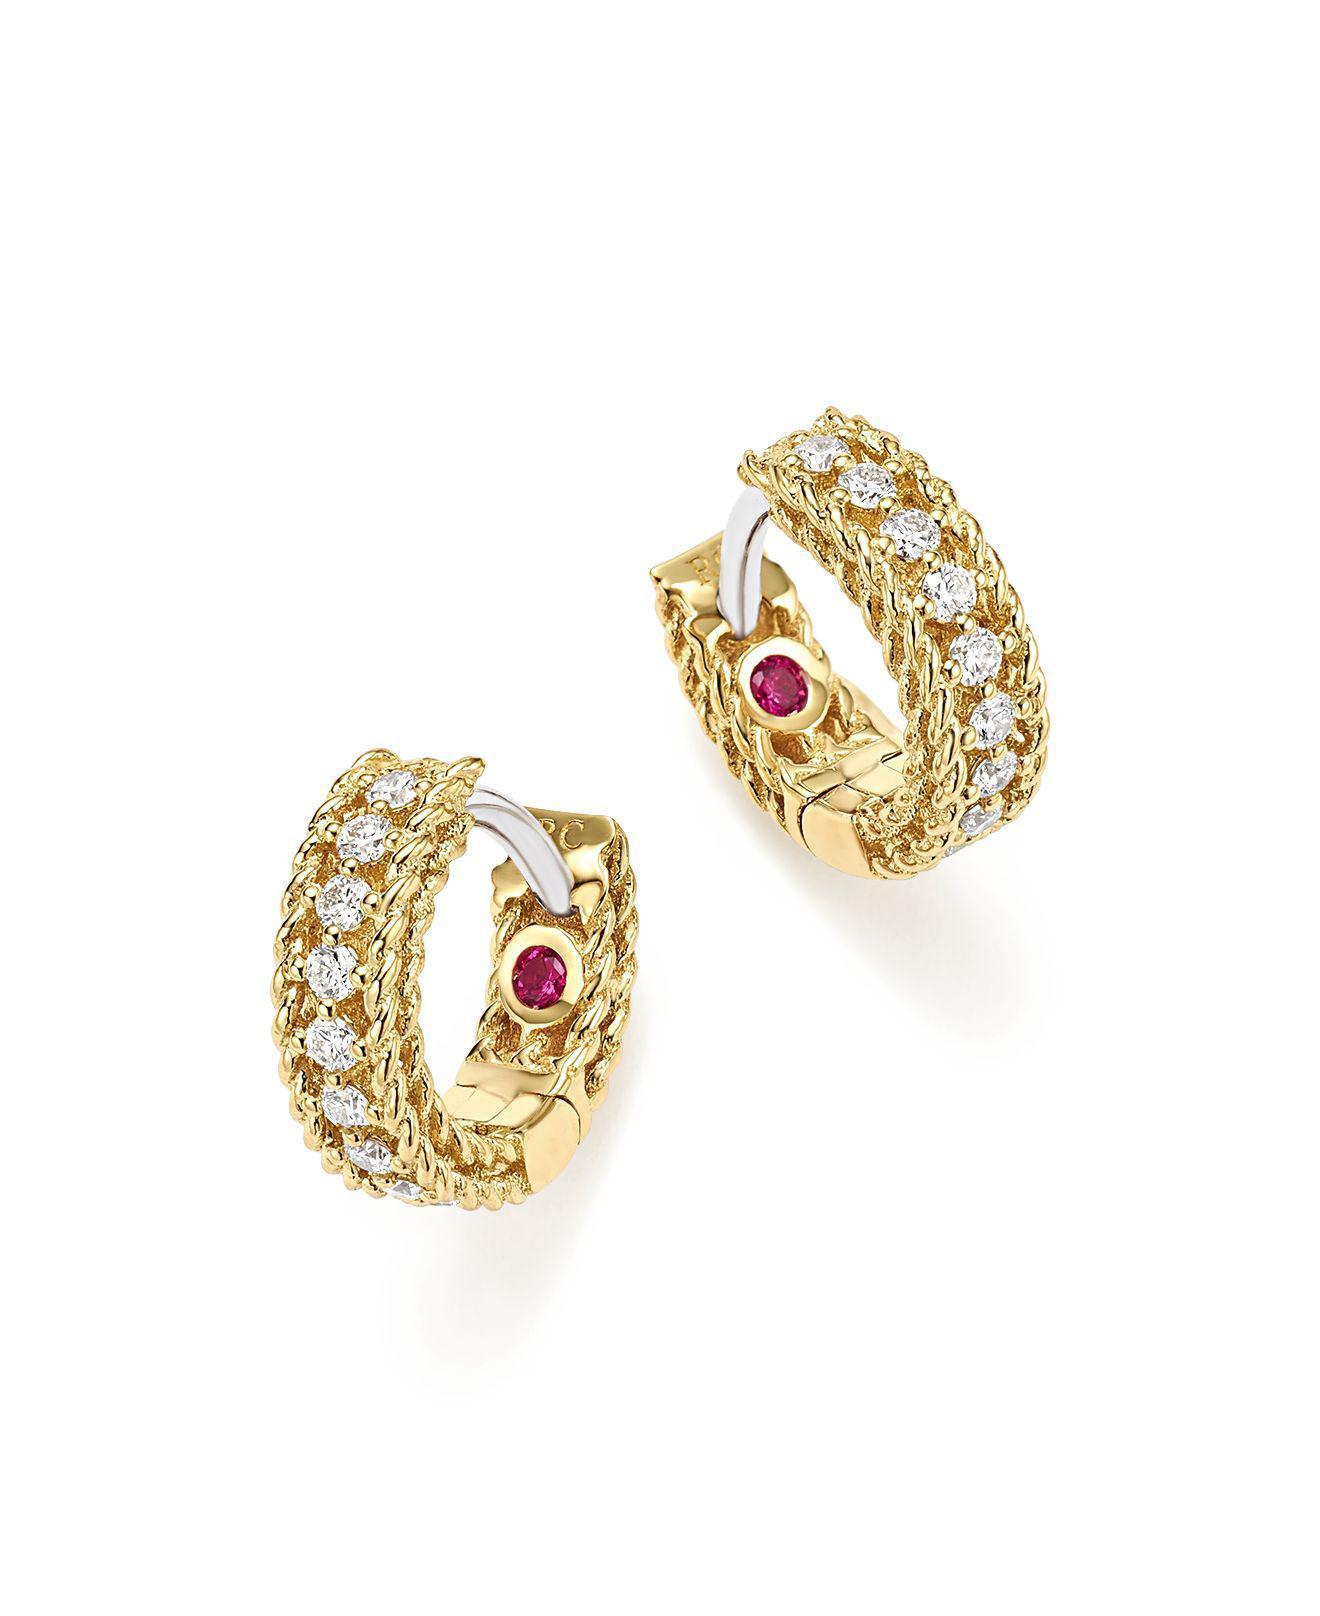 Roberto Coin Princess 18K Yellow Gold Diamond Bar Earrings pZCQmN